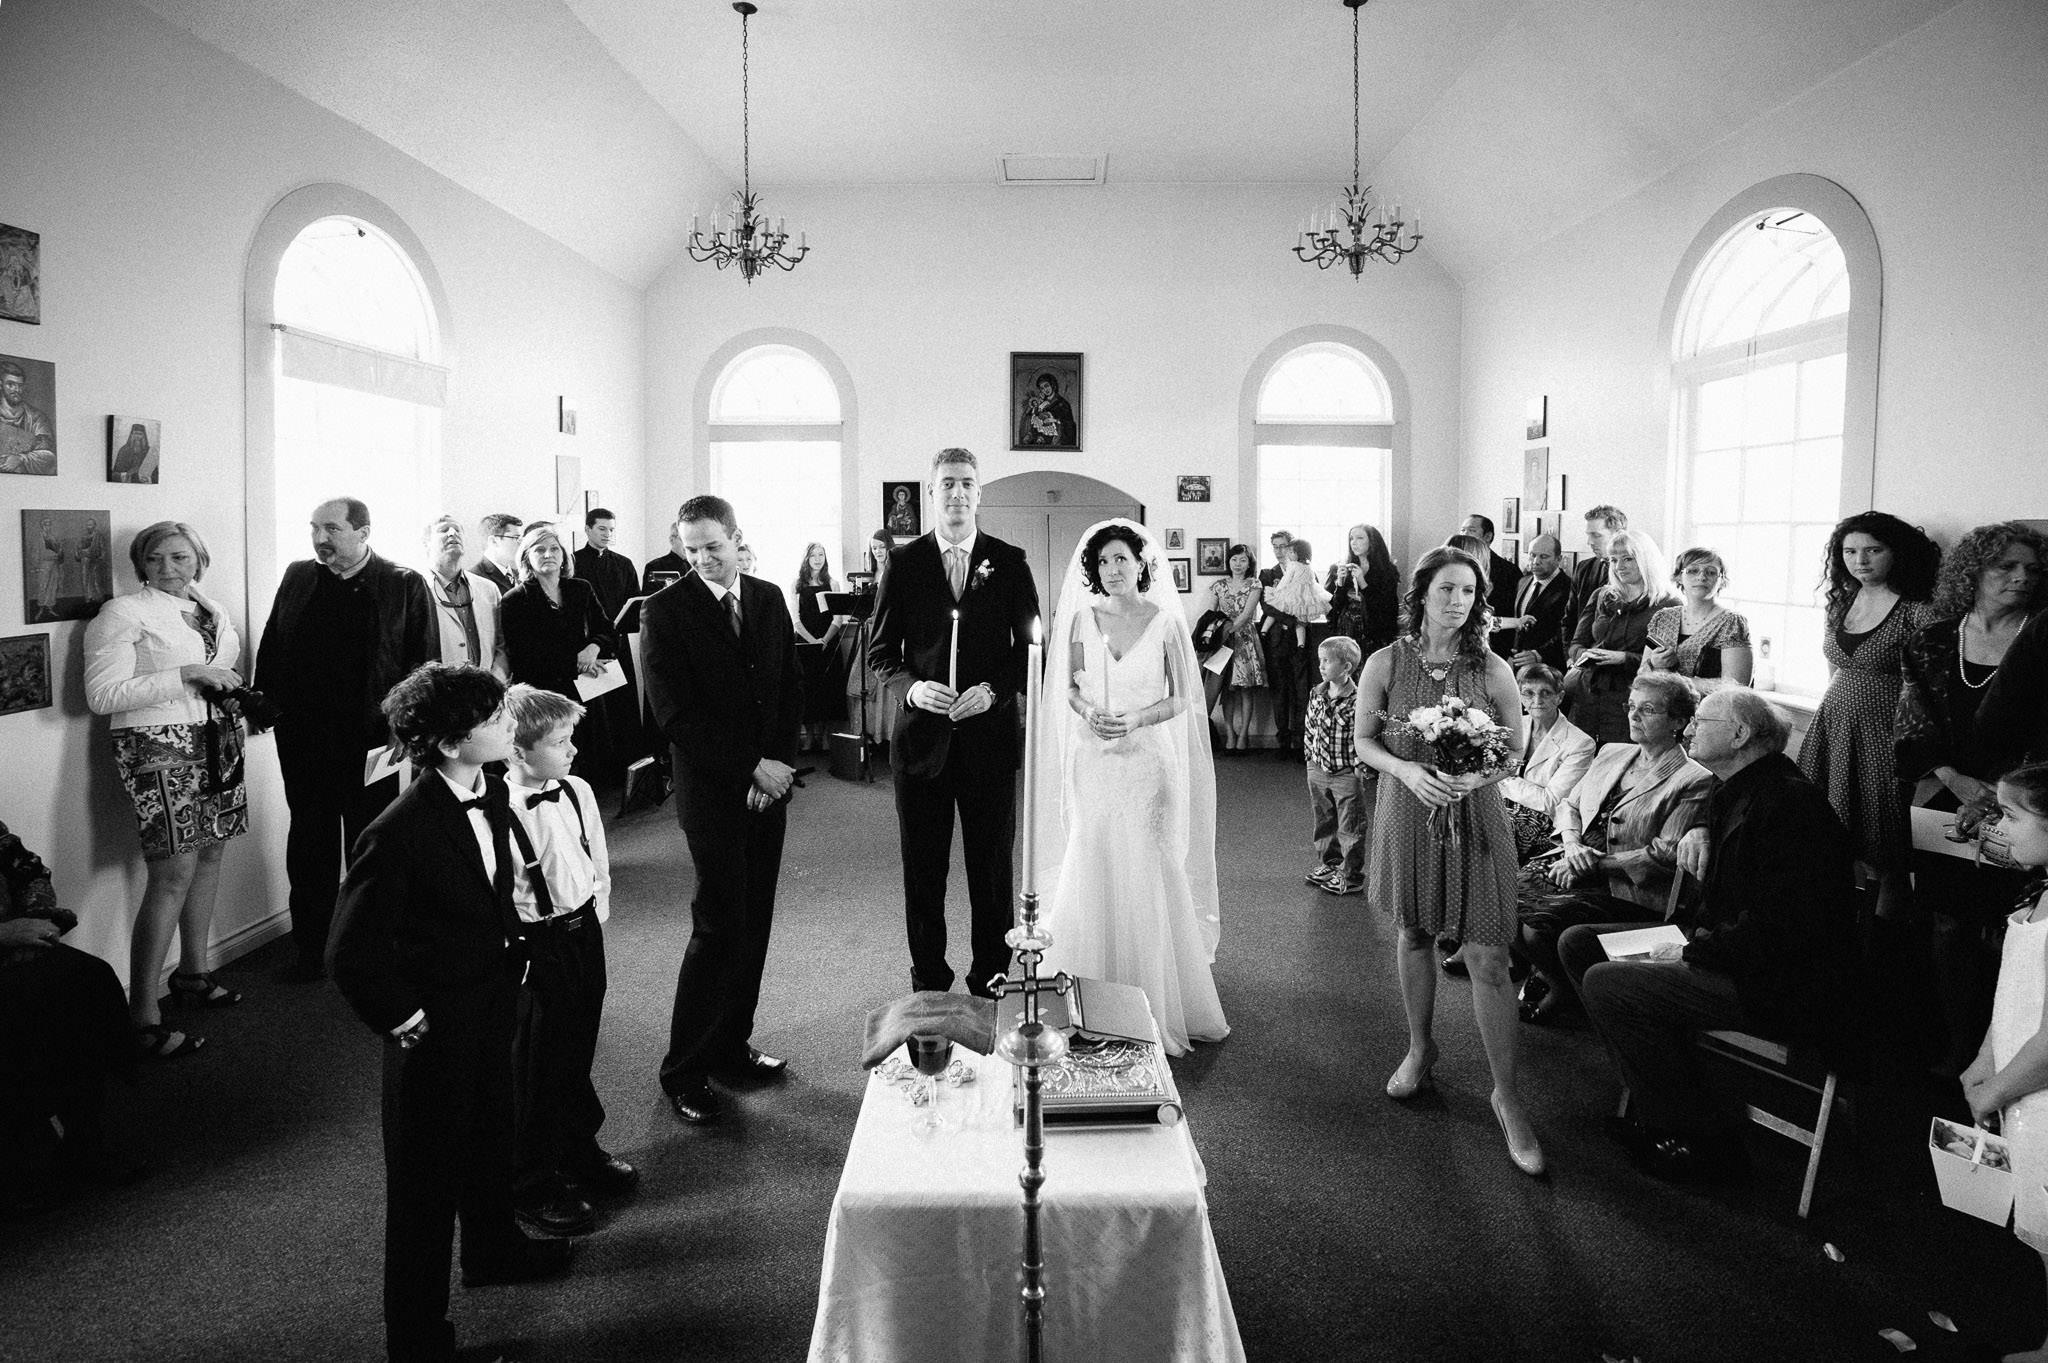 Wedding ceremony in a small church